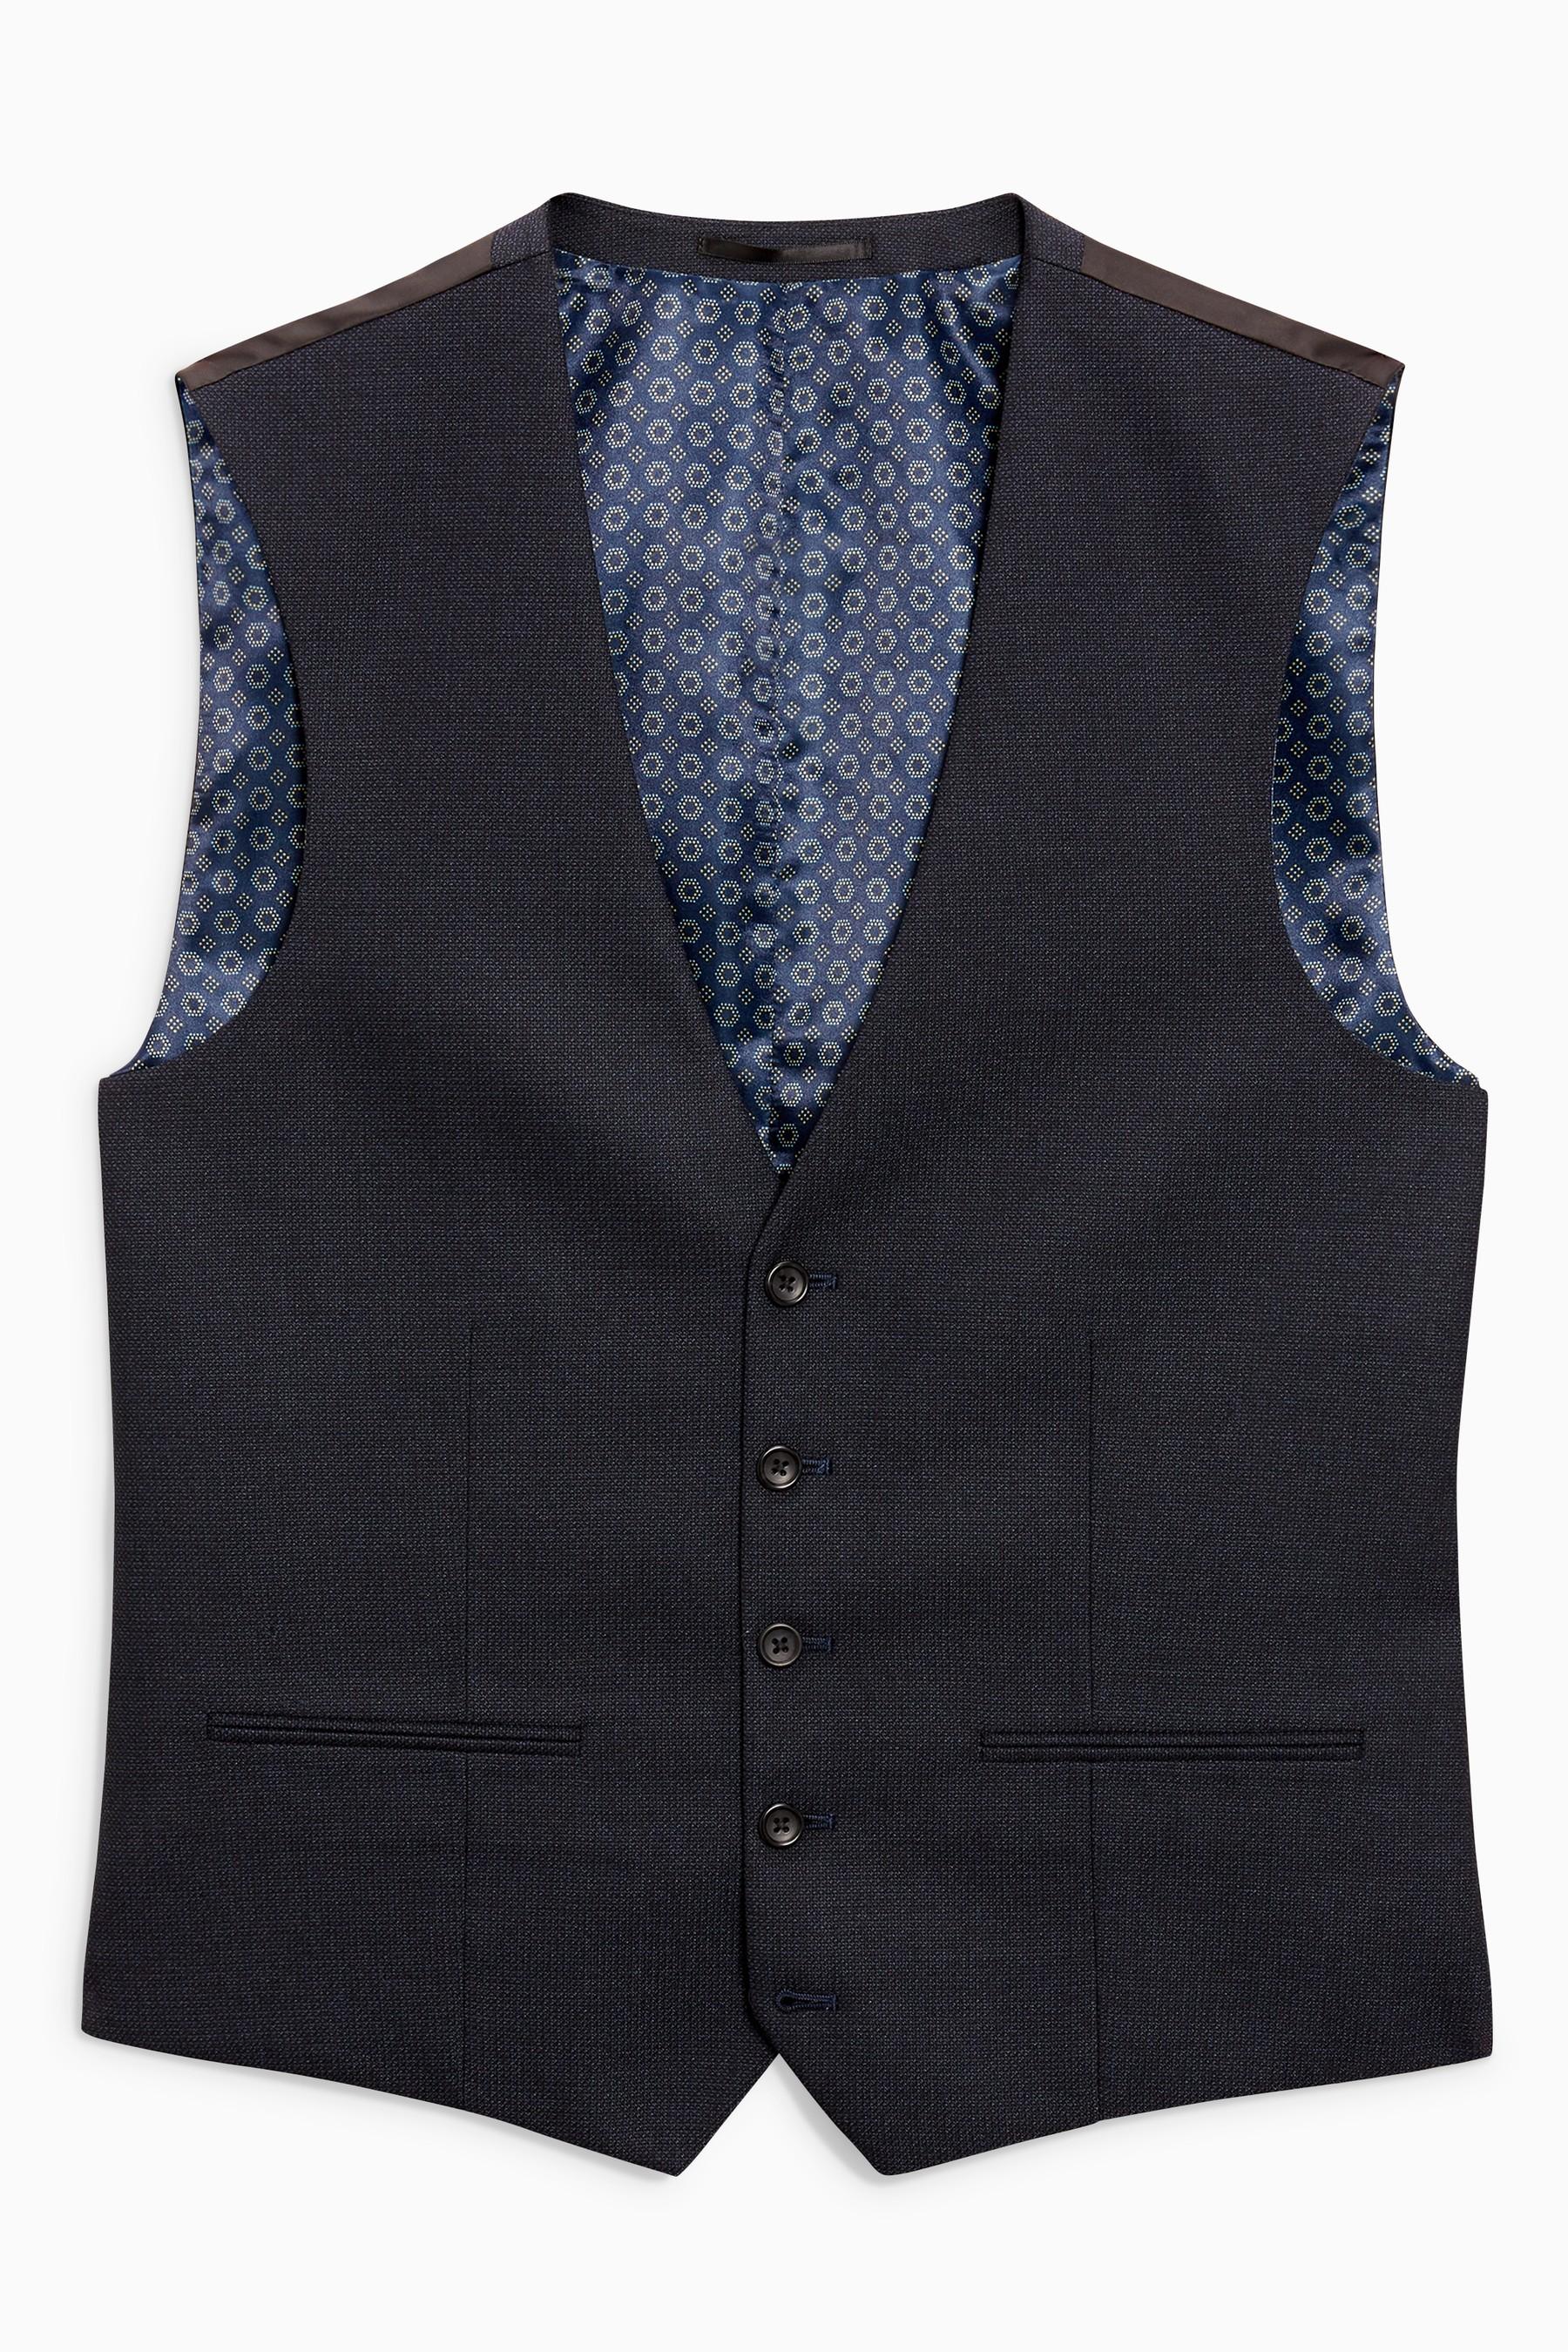 Next women's grey patterned wool Waistcoat size UK10 EU38 US6 () Armpit to armpit: 18